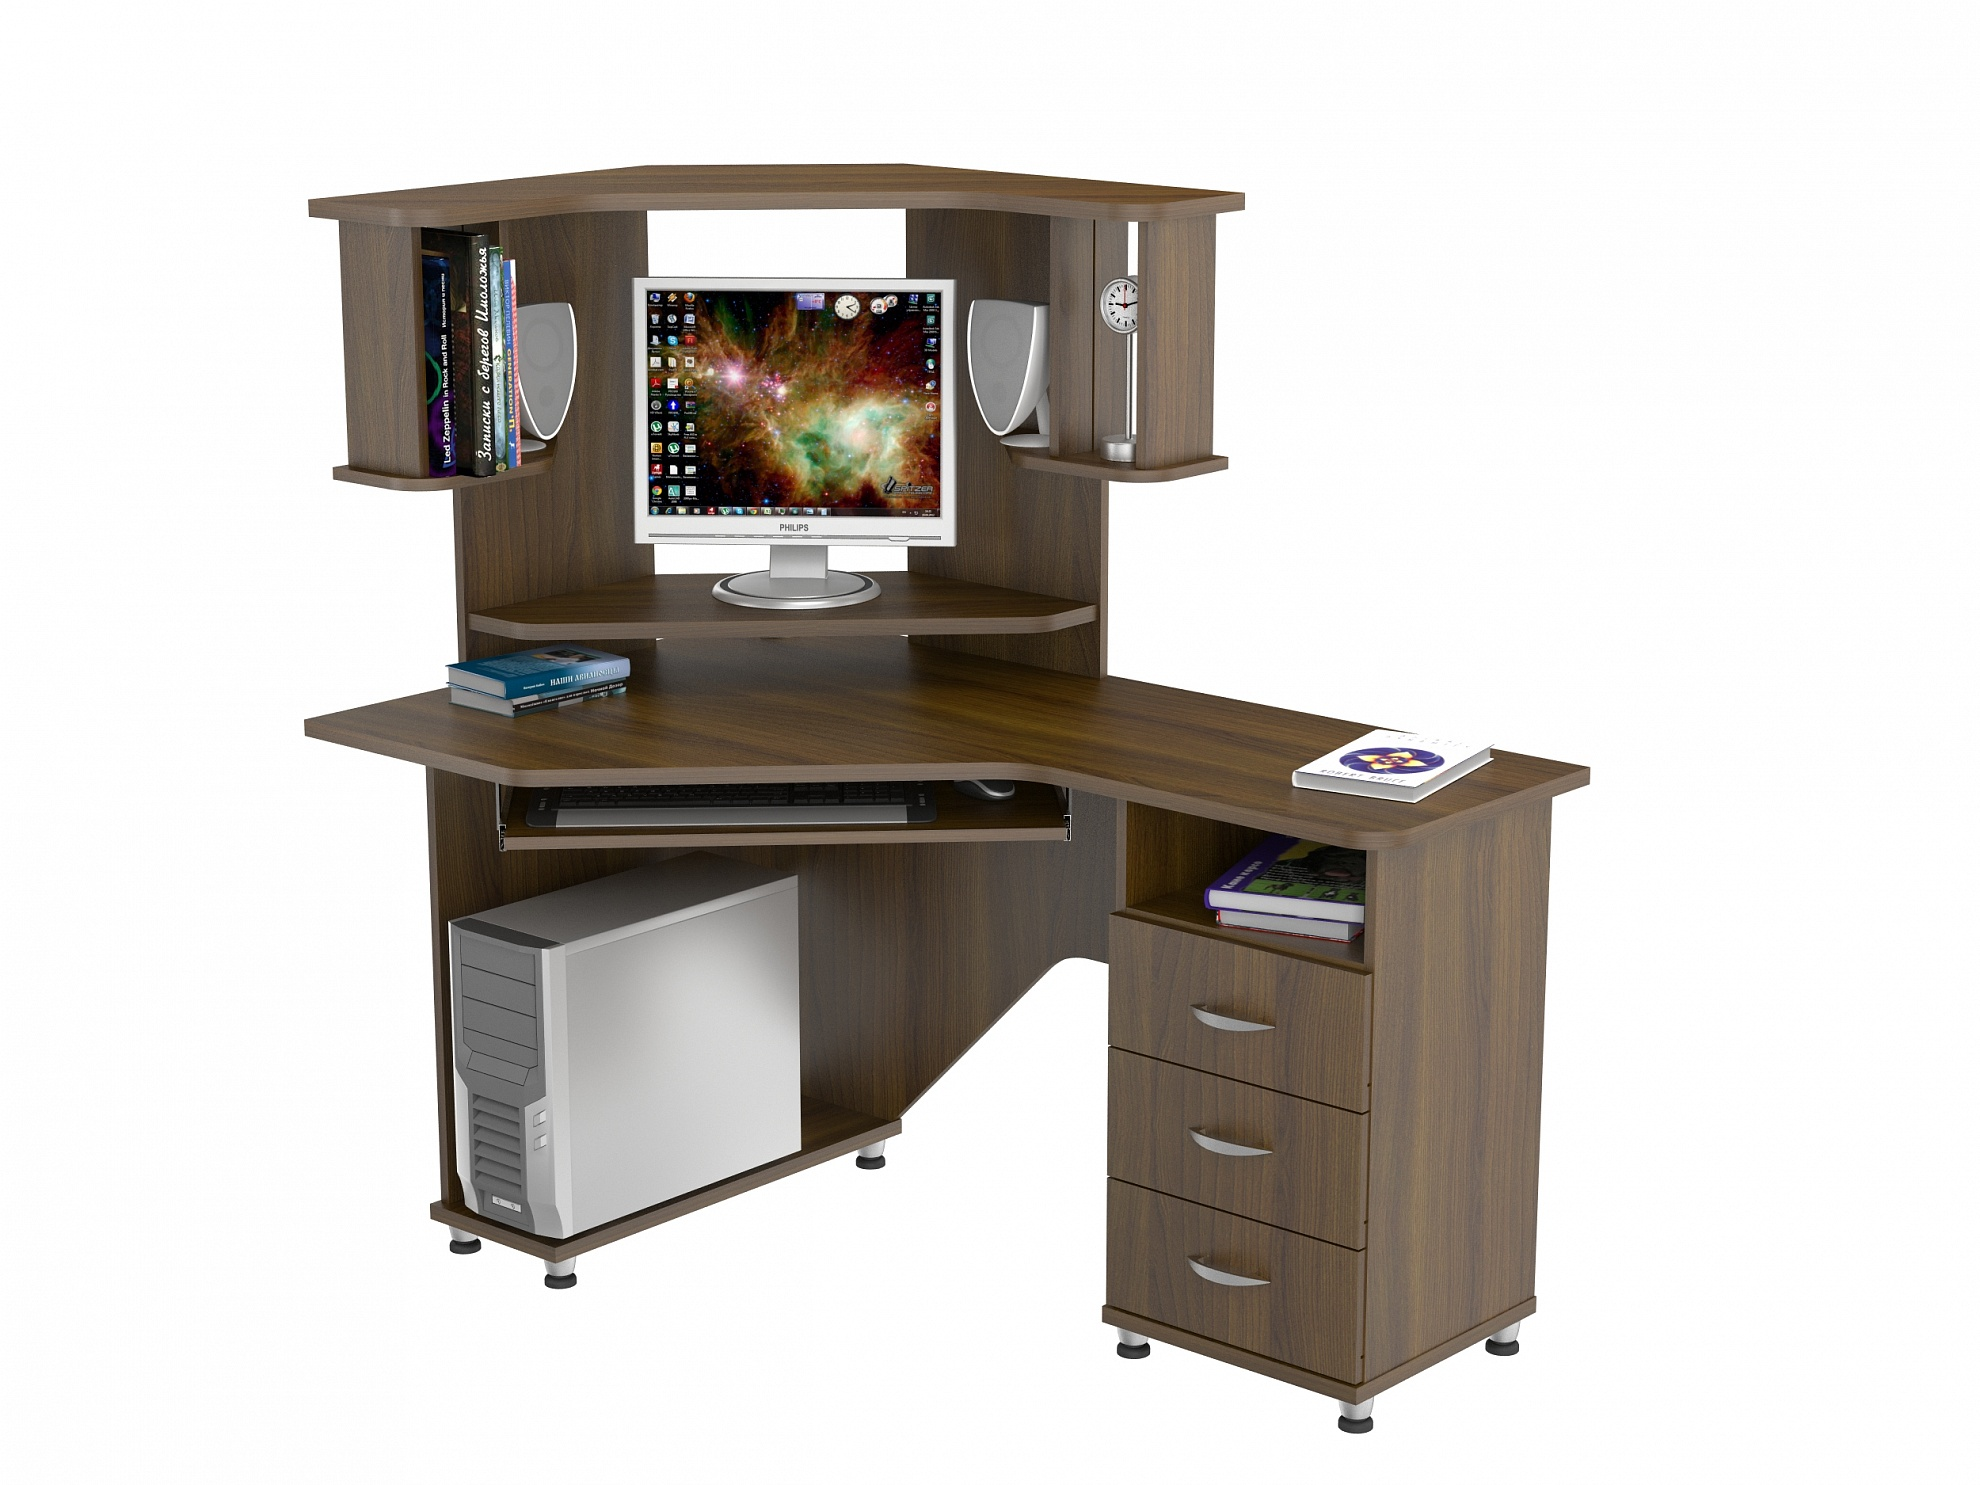 Компьютерный стол КС 20-17м2